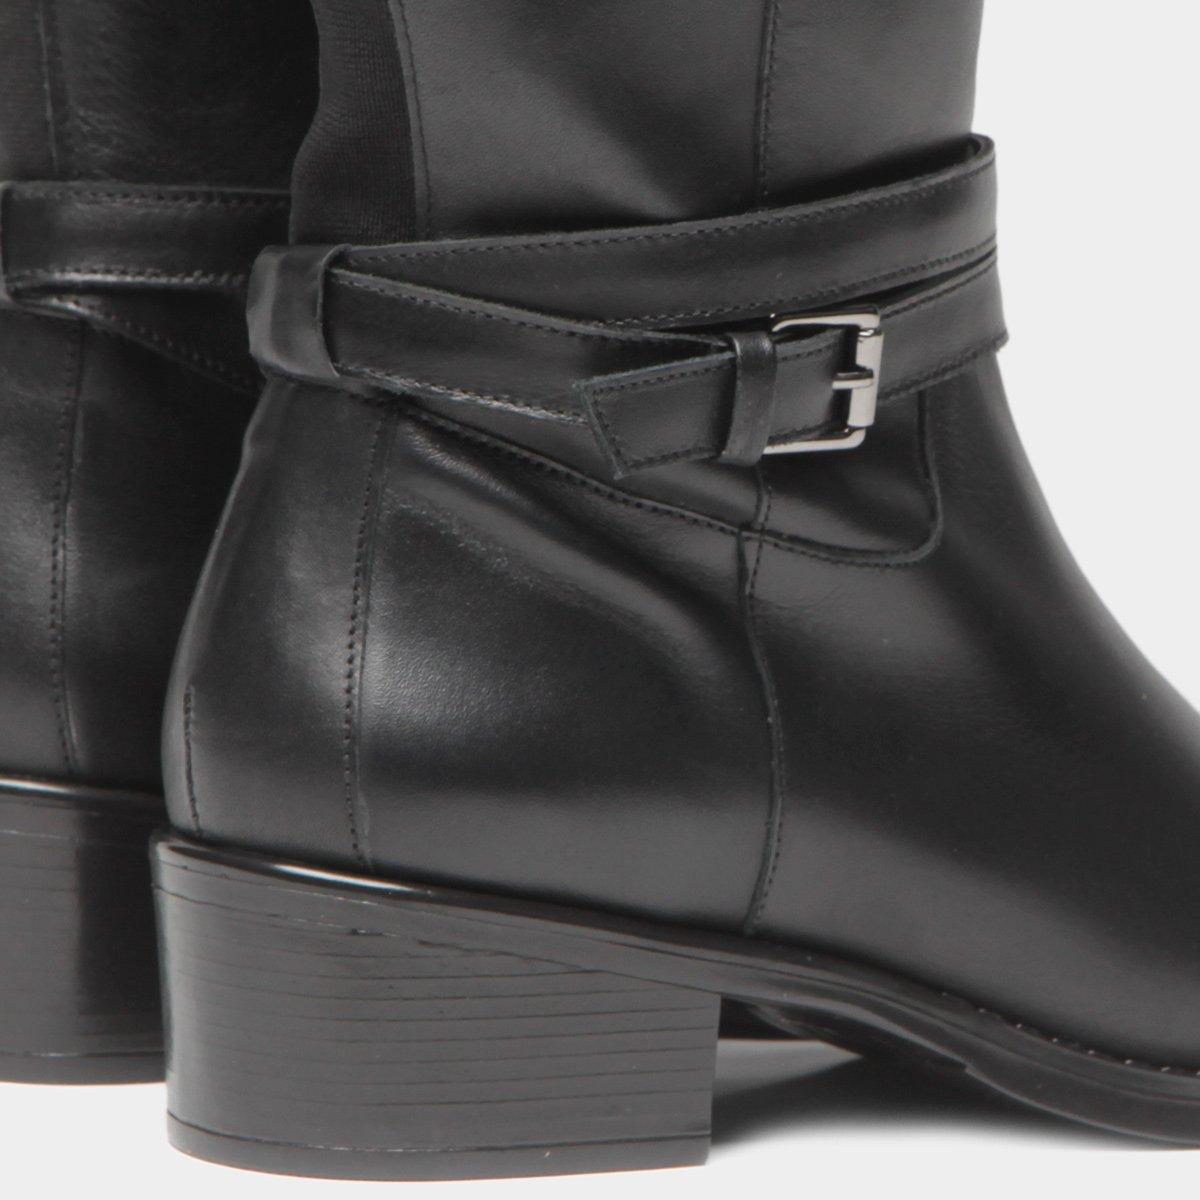 The Feminina Bota Couro Couro Over Preto Knee The Over Bota Fivelas Shoestock gqOvqYwr